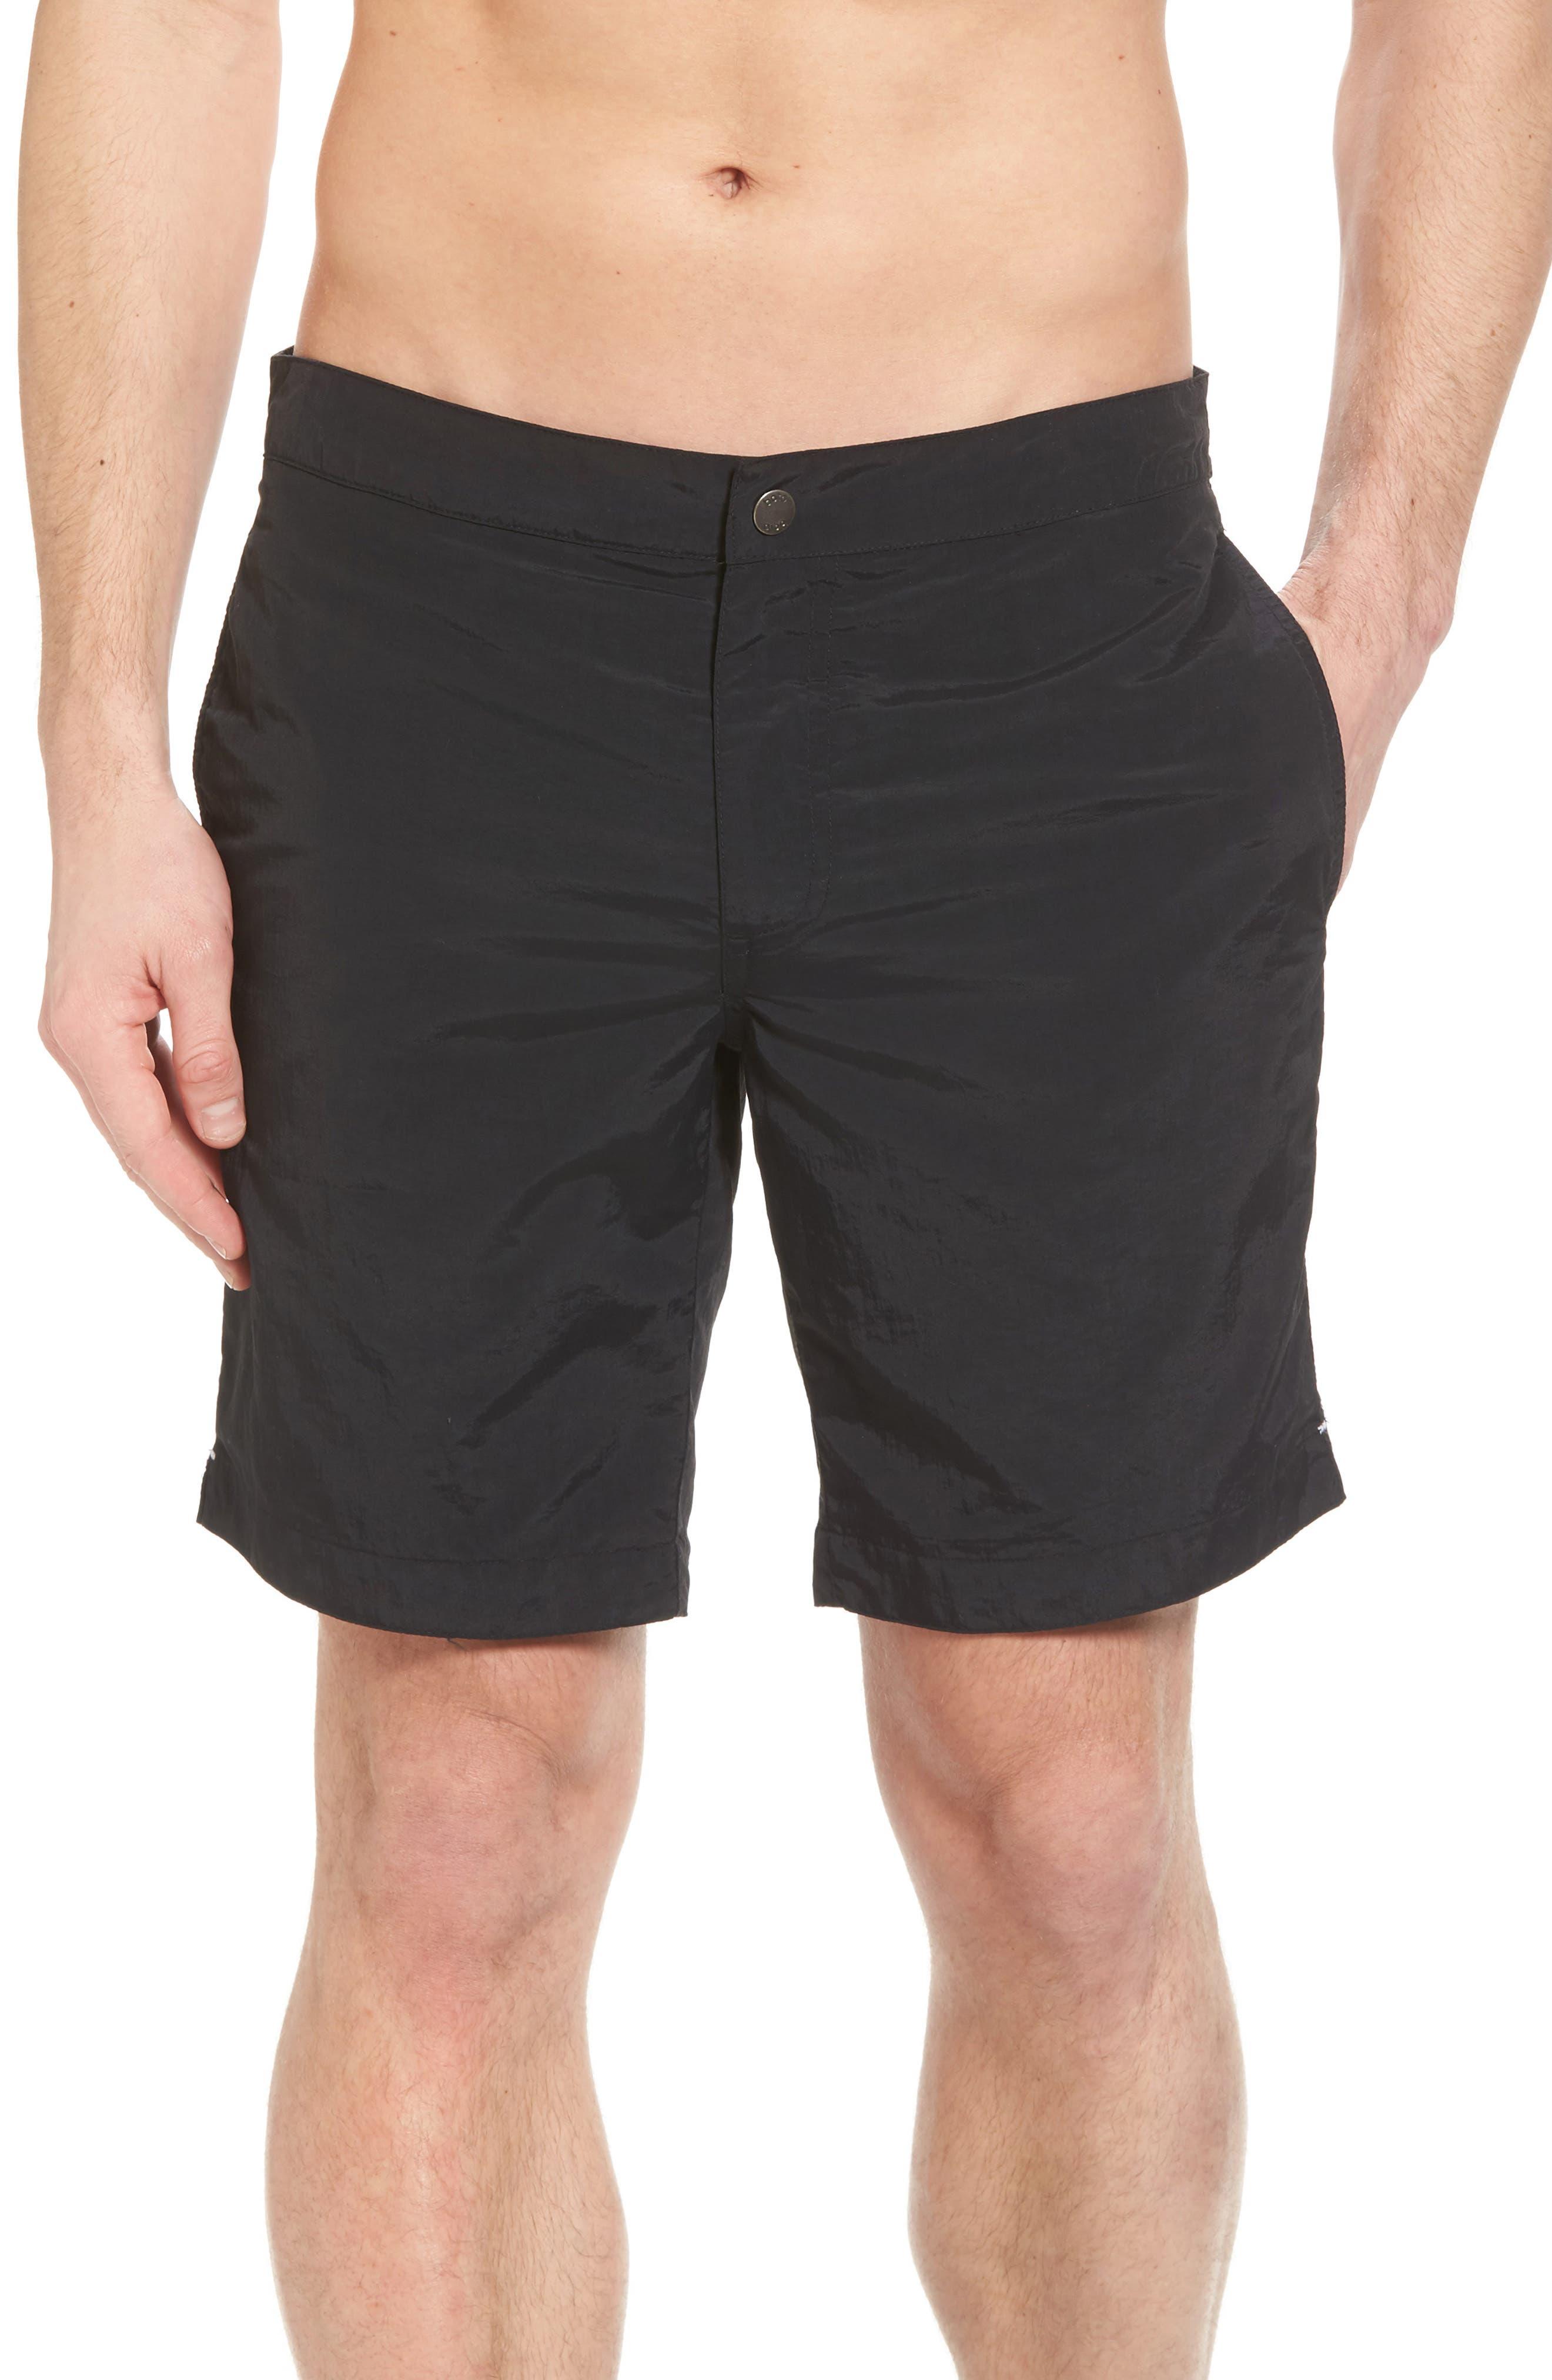 'Aruba - Island' Tailored Fit 8.5 Inch Board Shorts,                         Main,                         color, 001